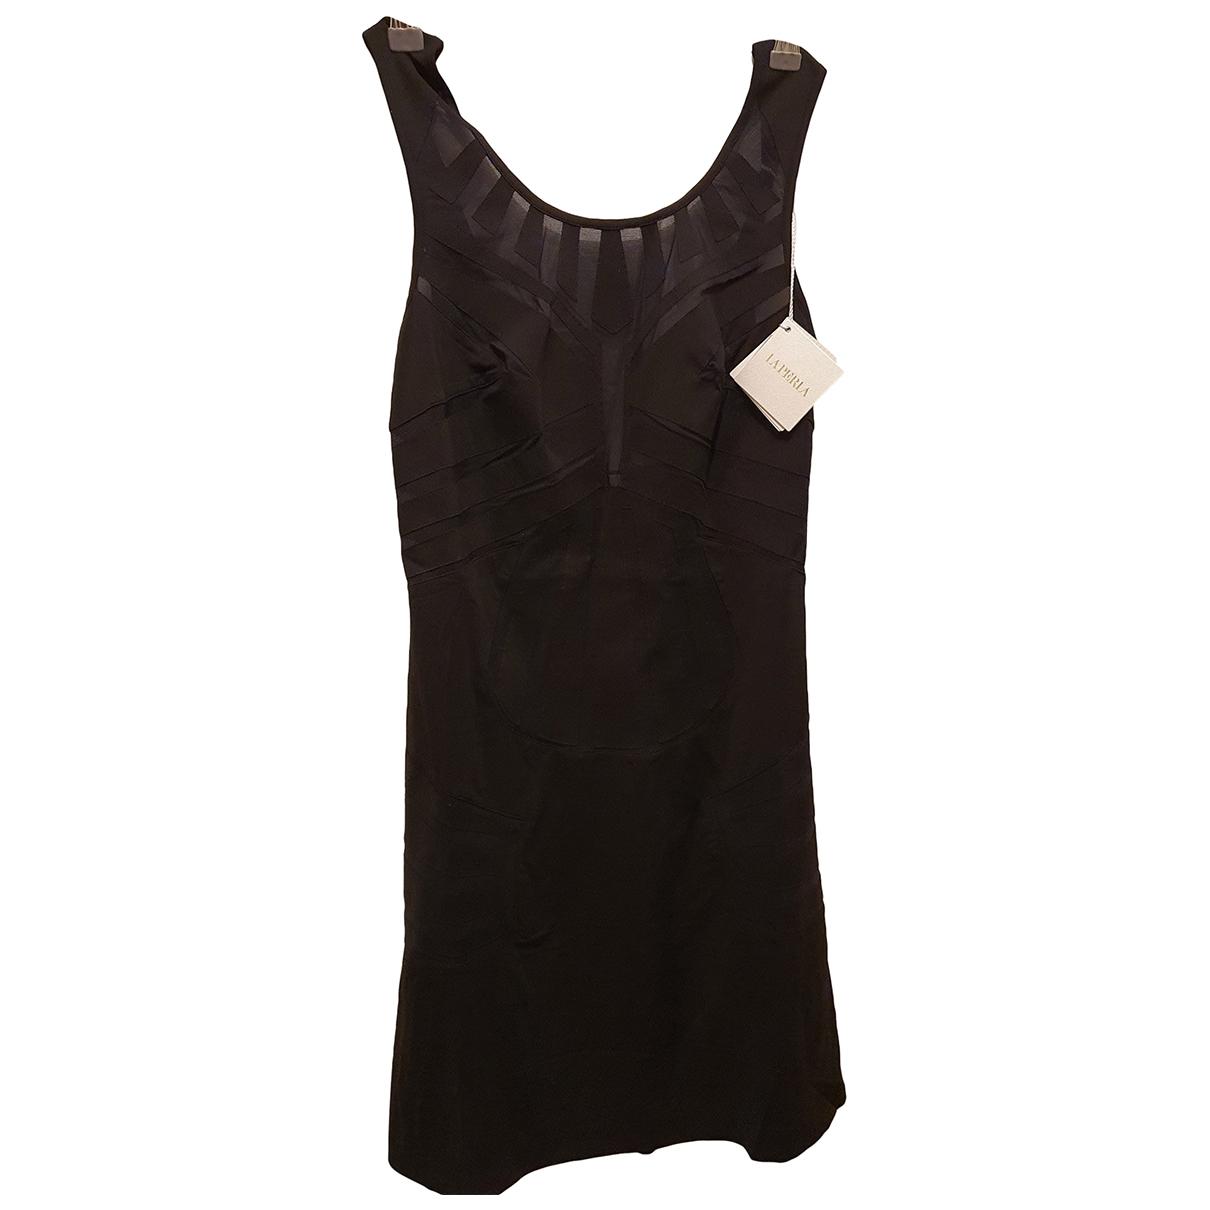 La Perla \N Black dress for Women 40 FR